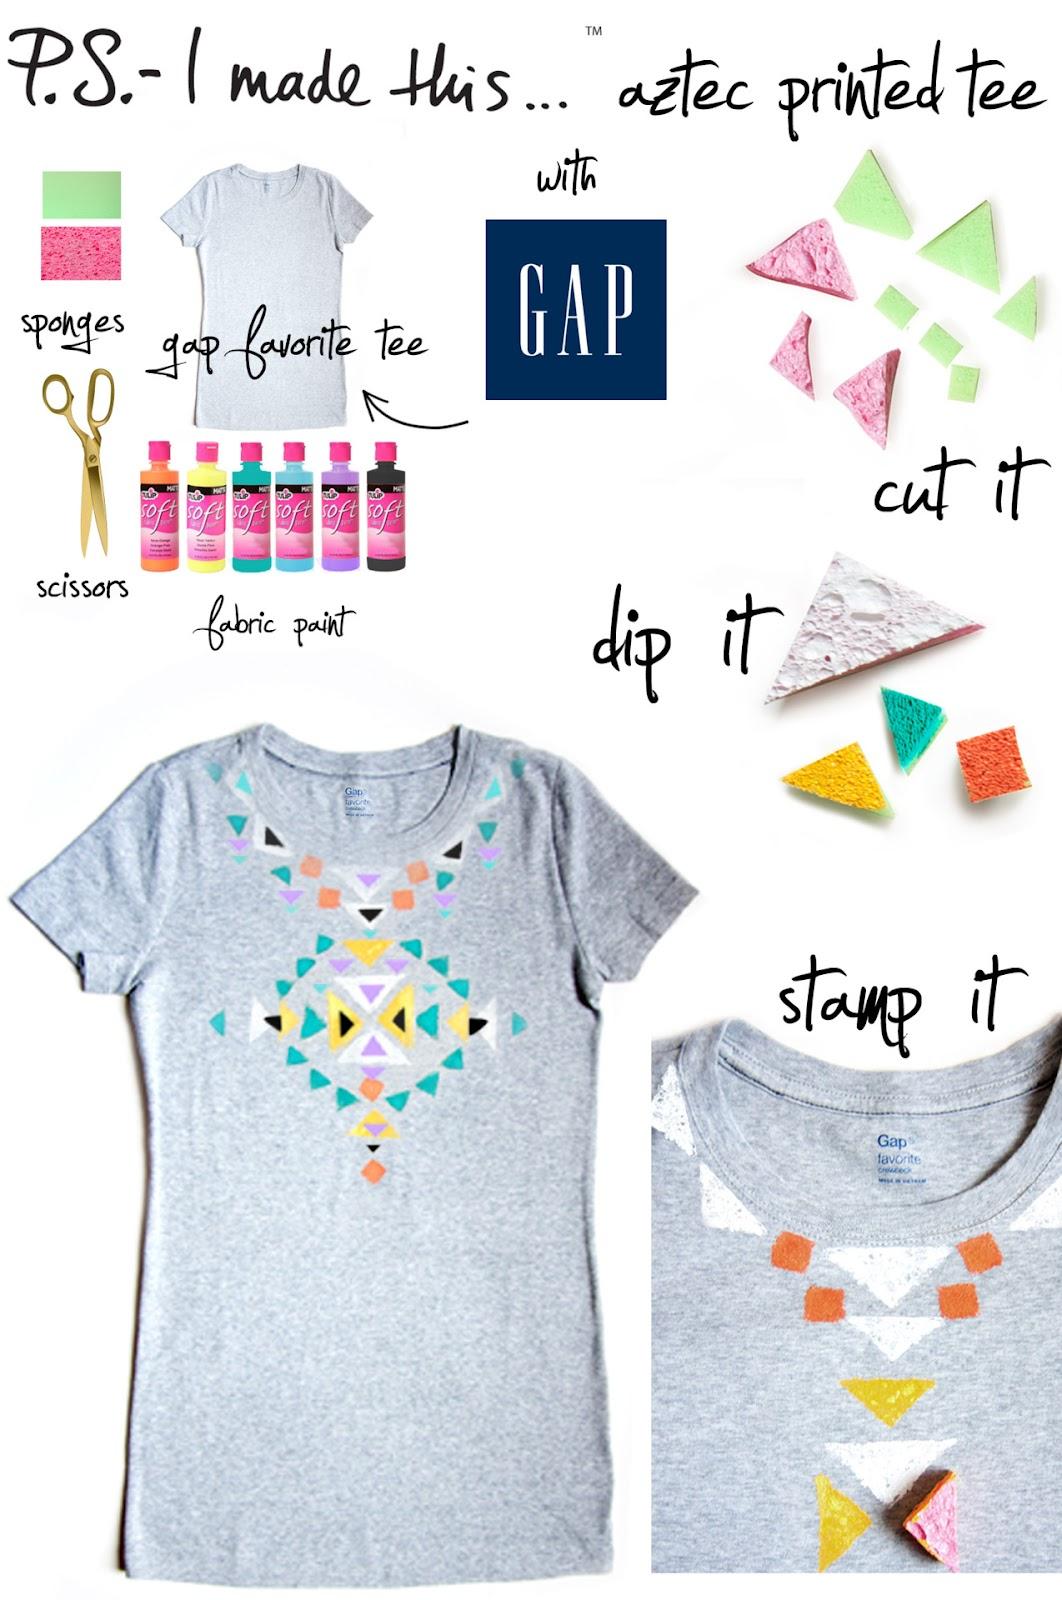 Simply be you tiful diy aztec printed t shirt from p s for Diy tee shirt printing